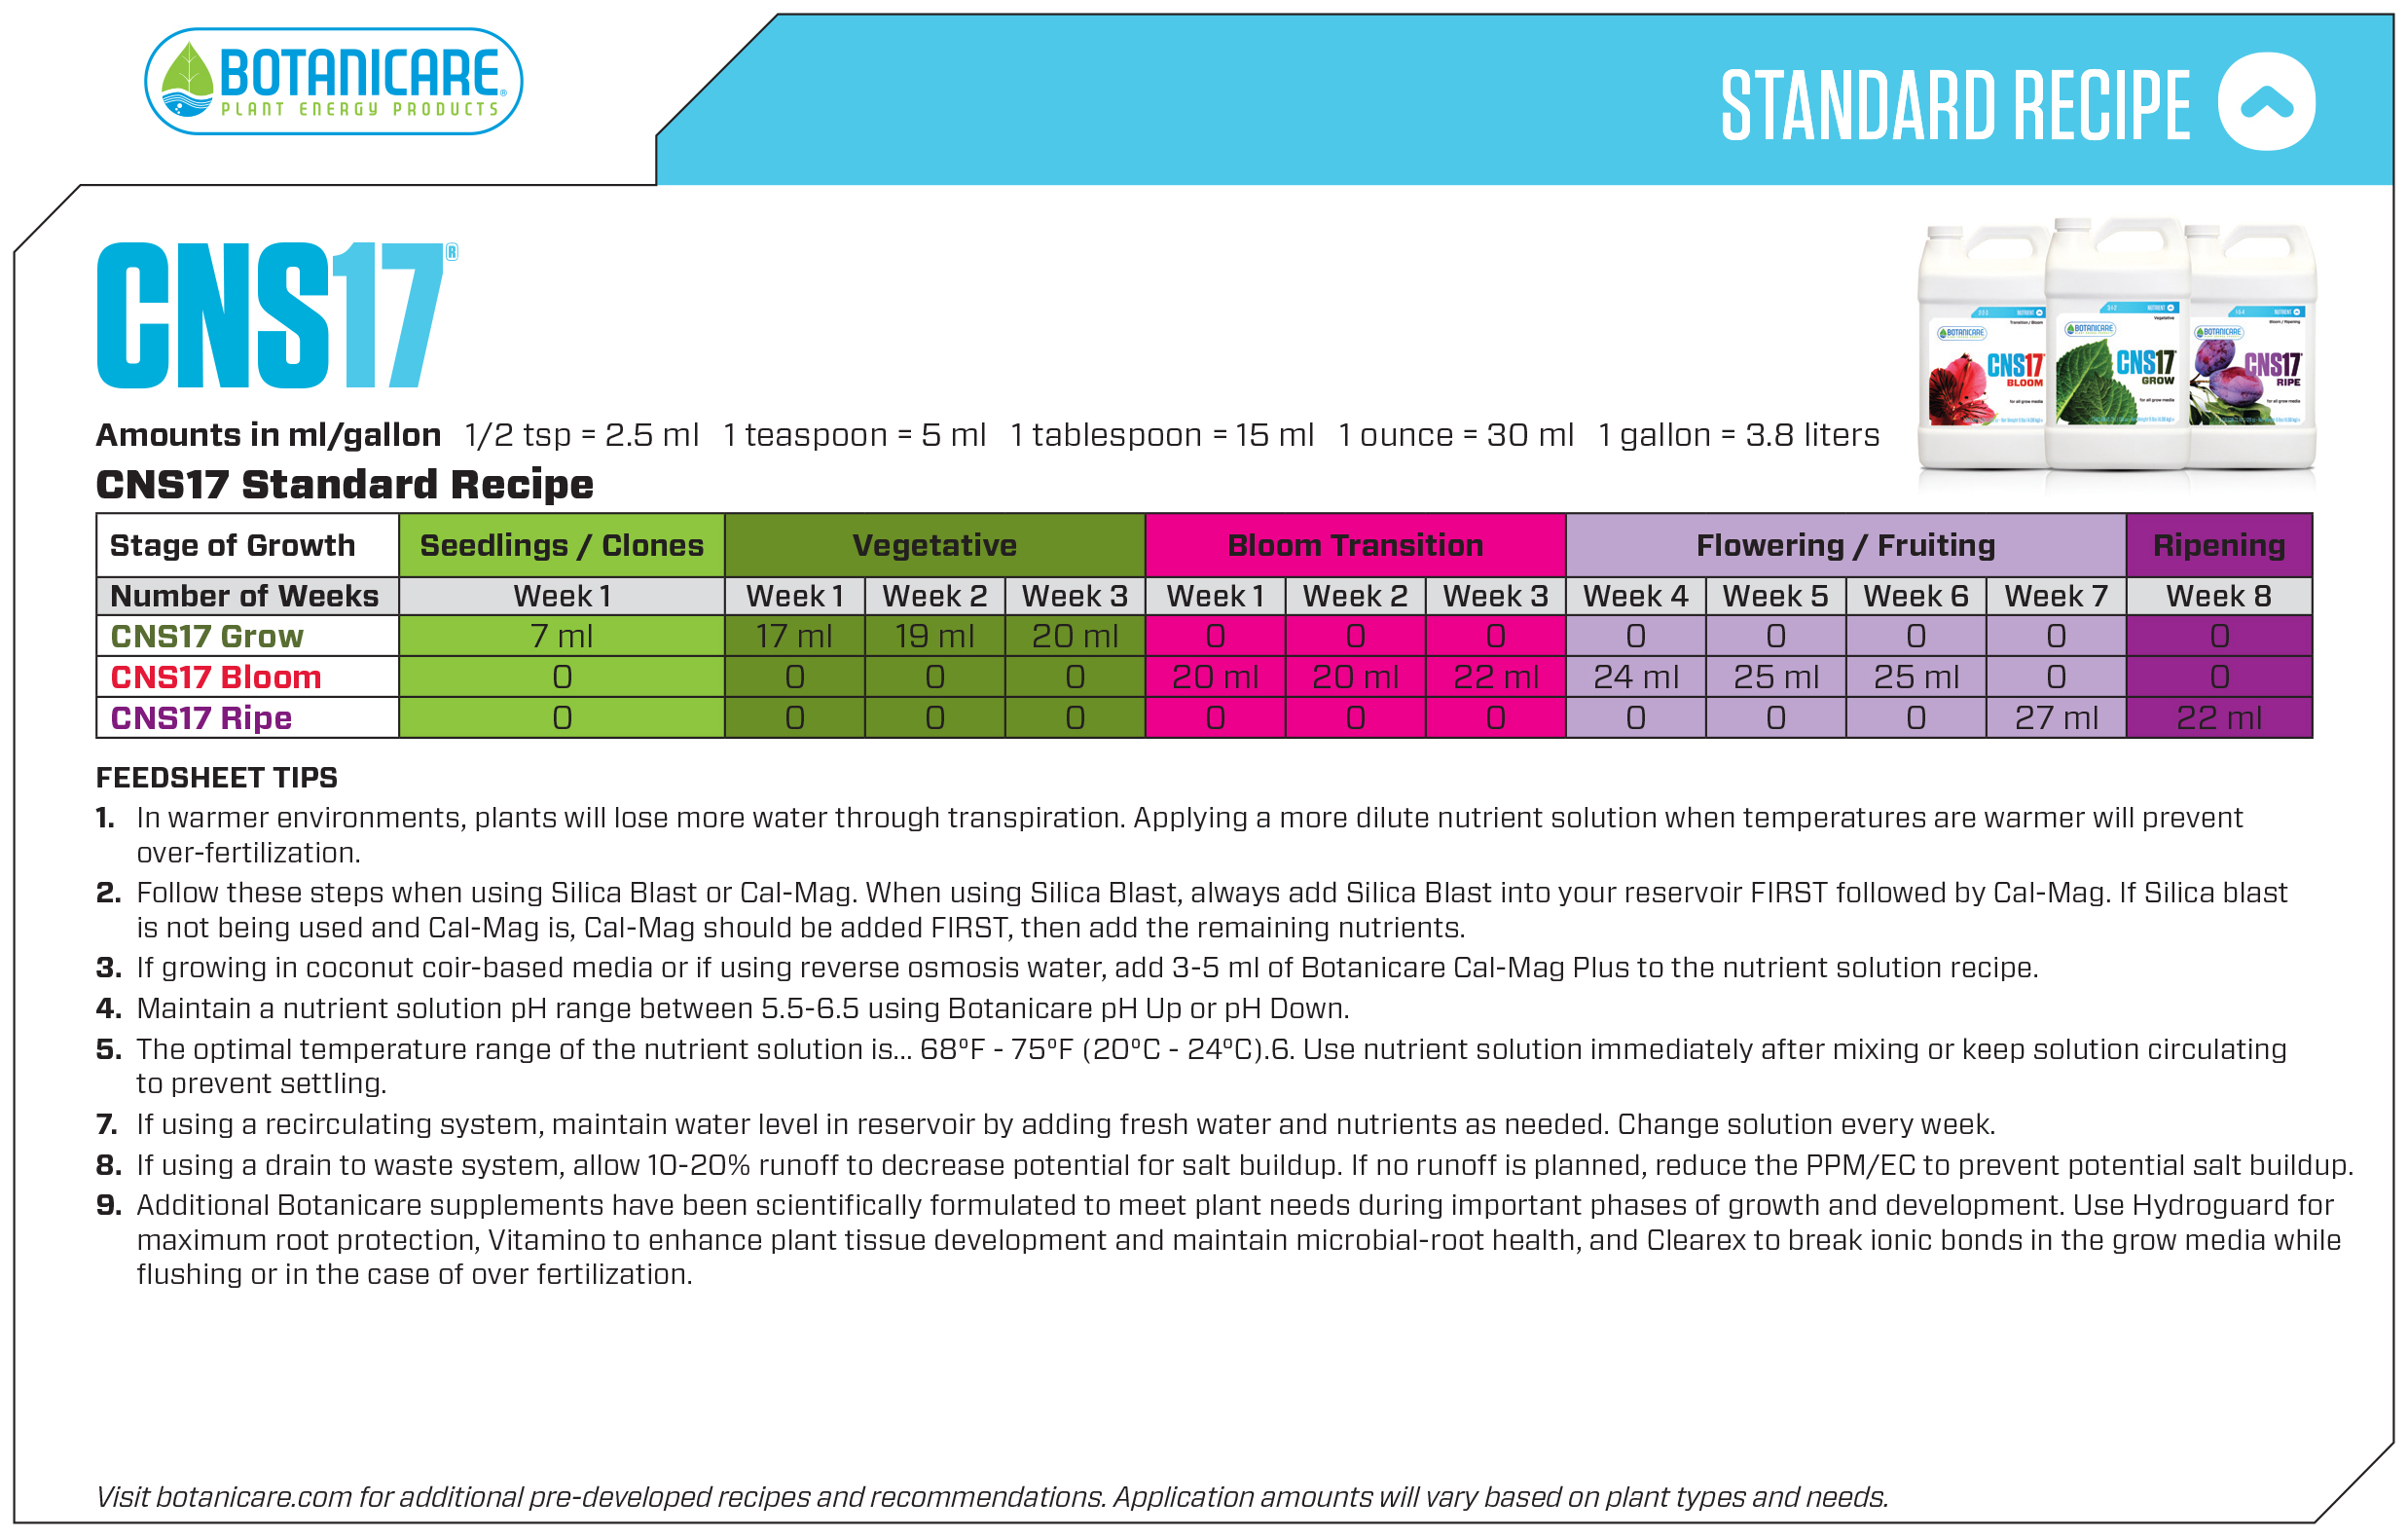 Botanicare Feedsheets/Nutrient Charts